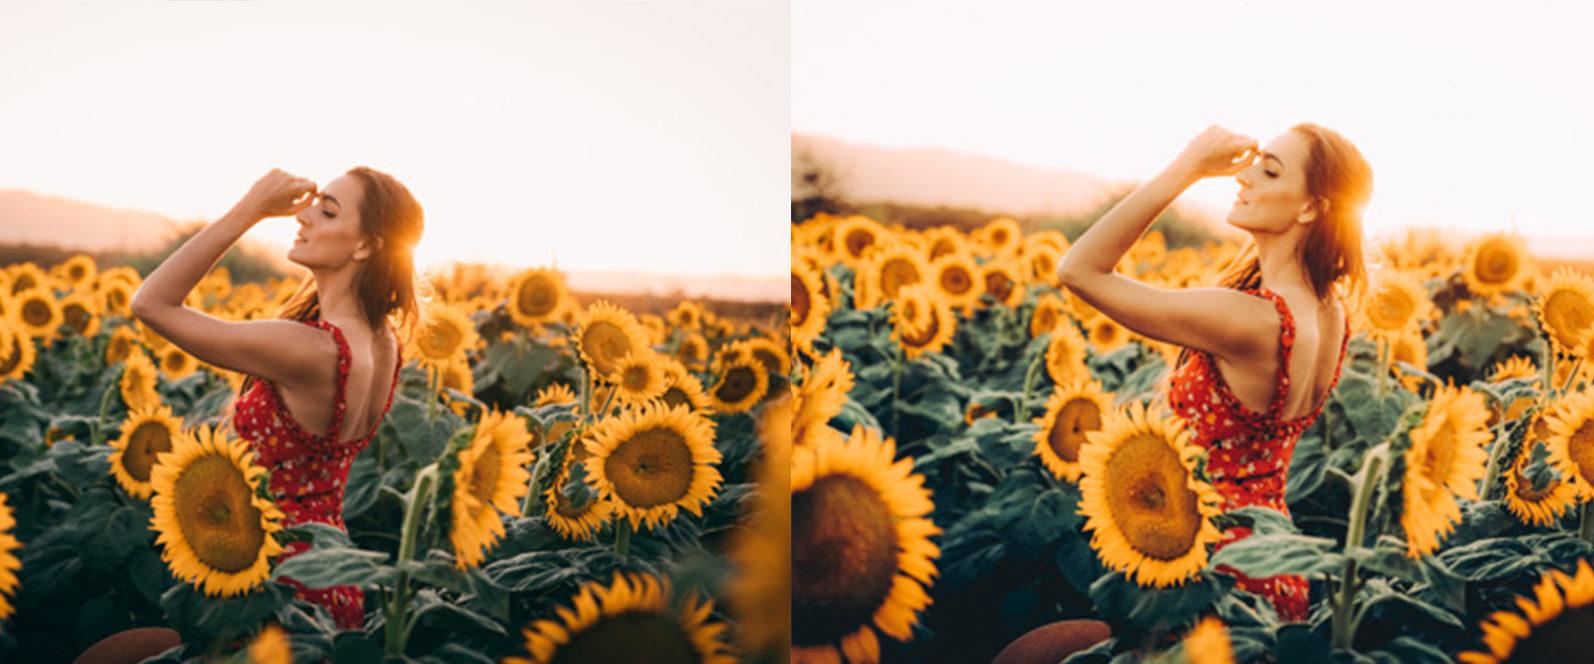 12 x Sunflower Fields Lightroom Presets   Warm Lightroom Presets   Yellow Presets - 11 Sunflower Fields -